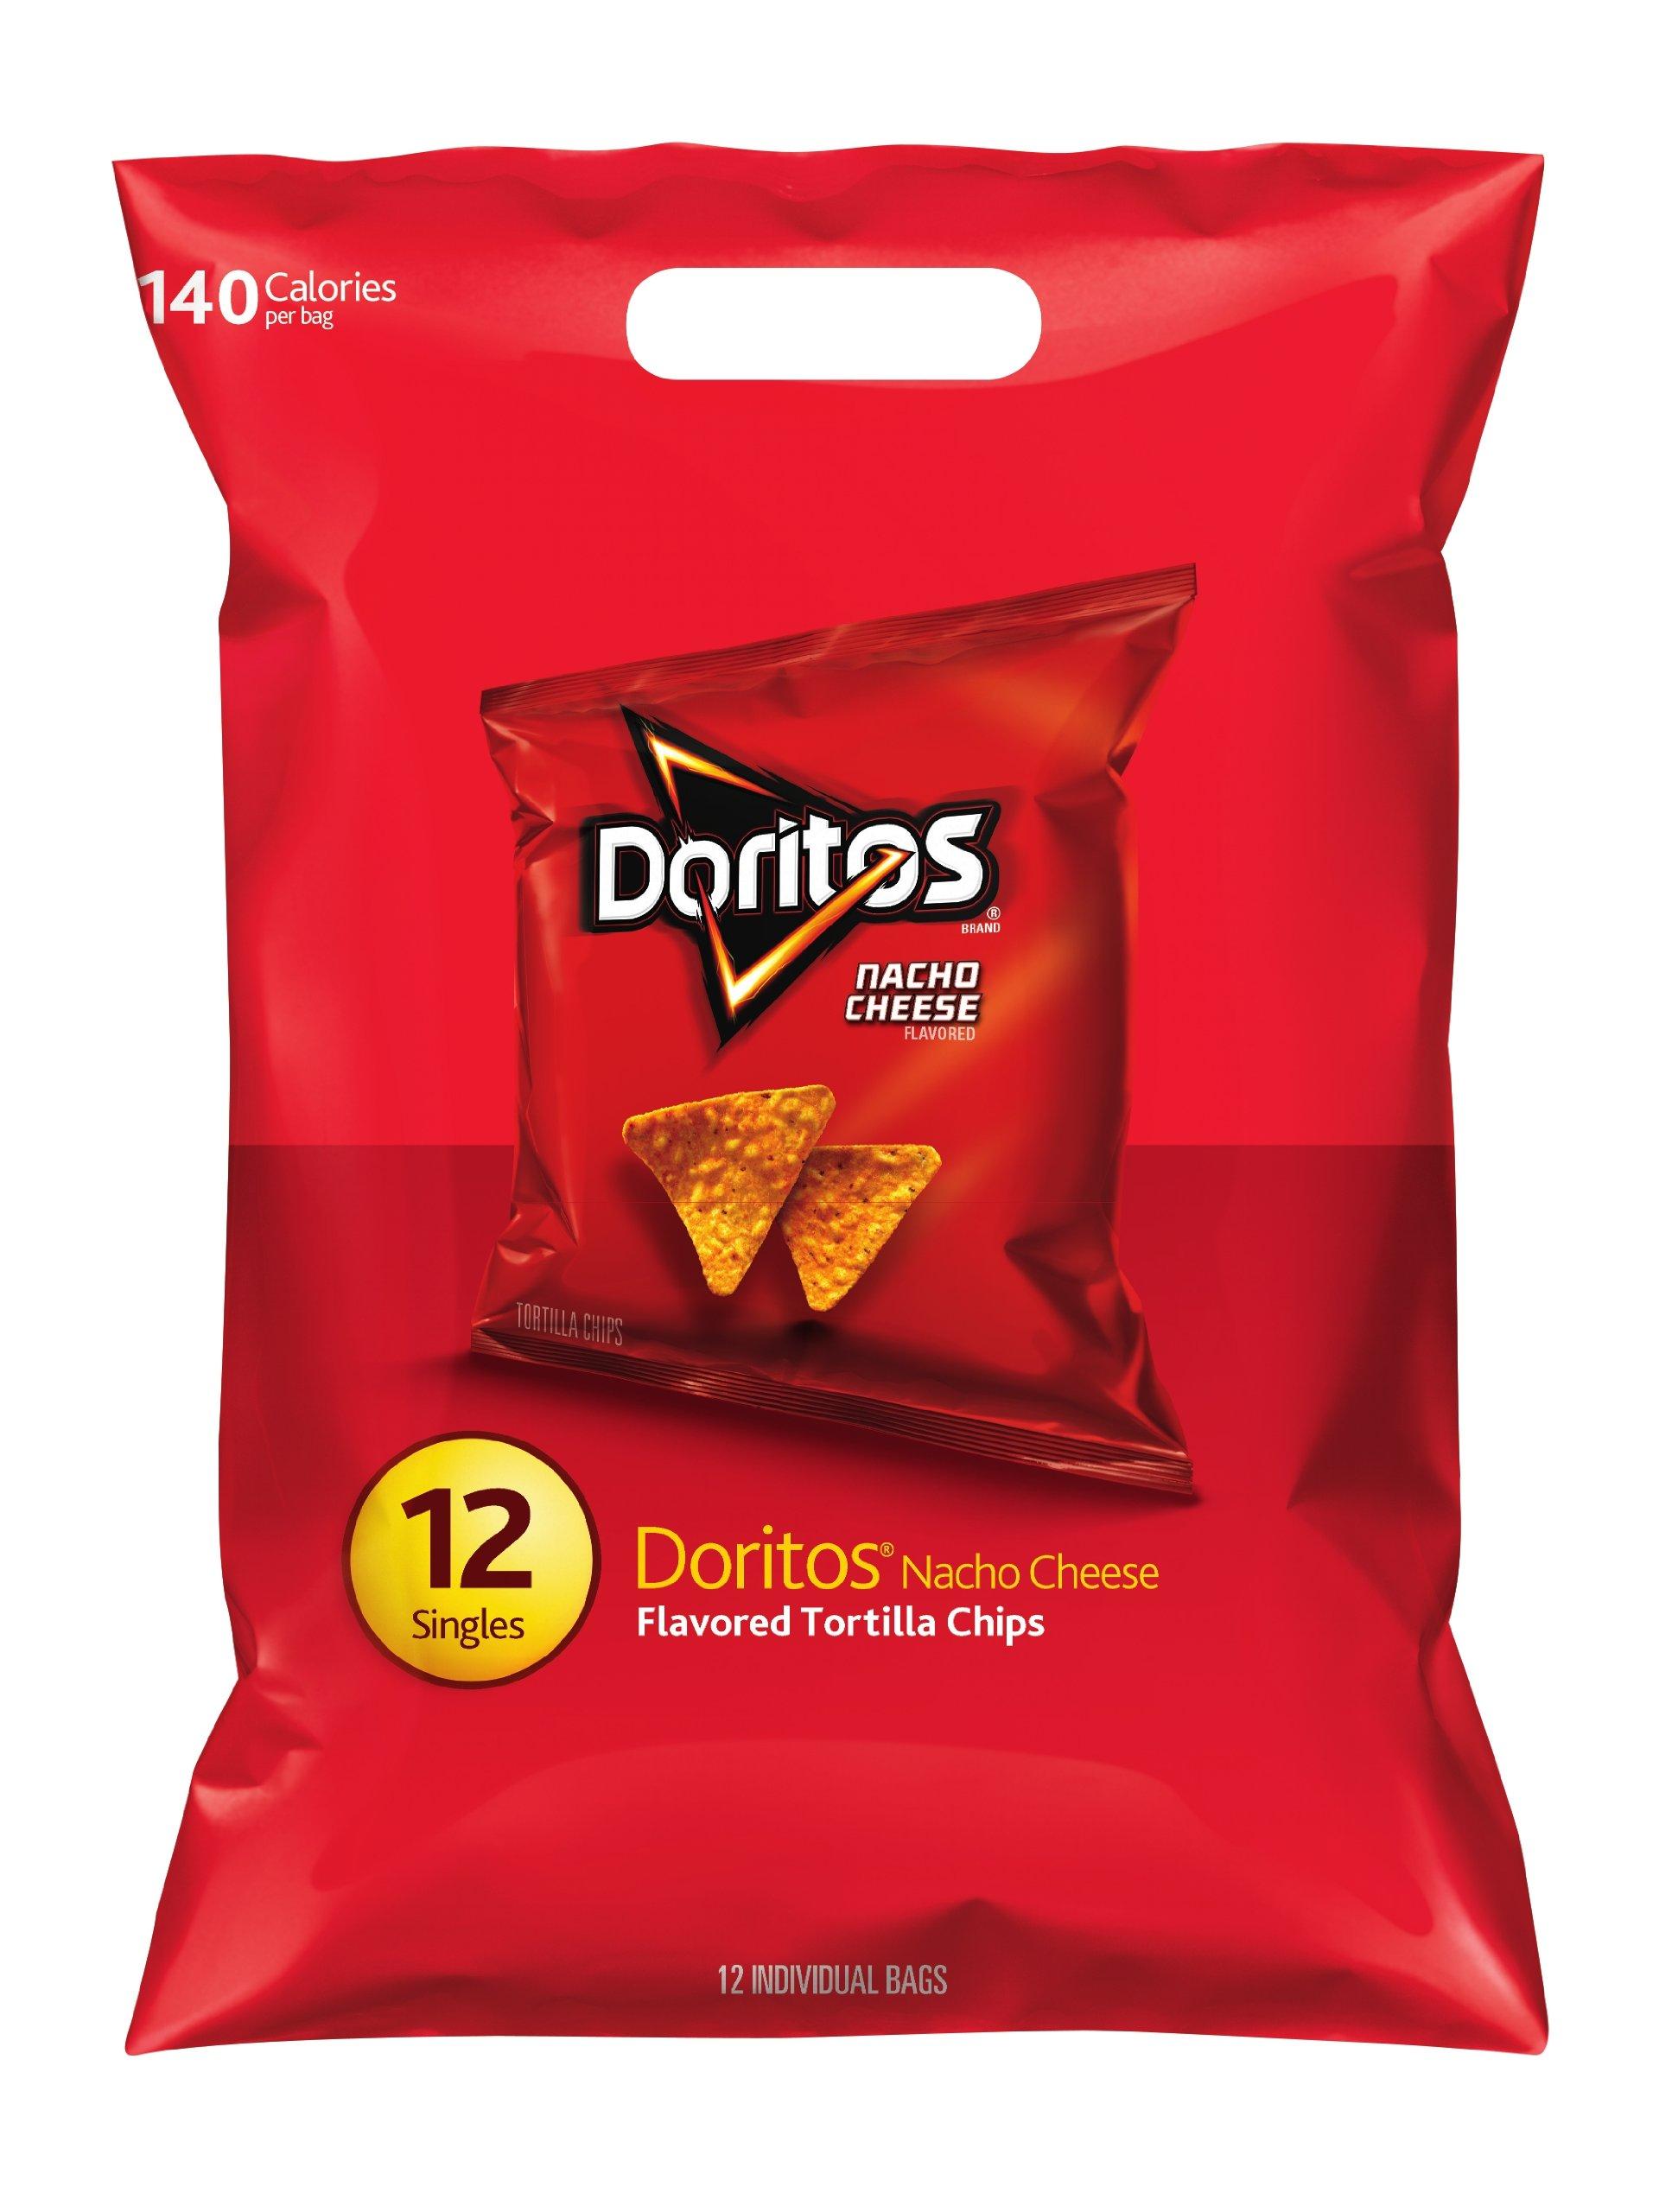 Doritos Nacho Cheese Flavored Tortilla Chips, 12 Singles